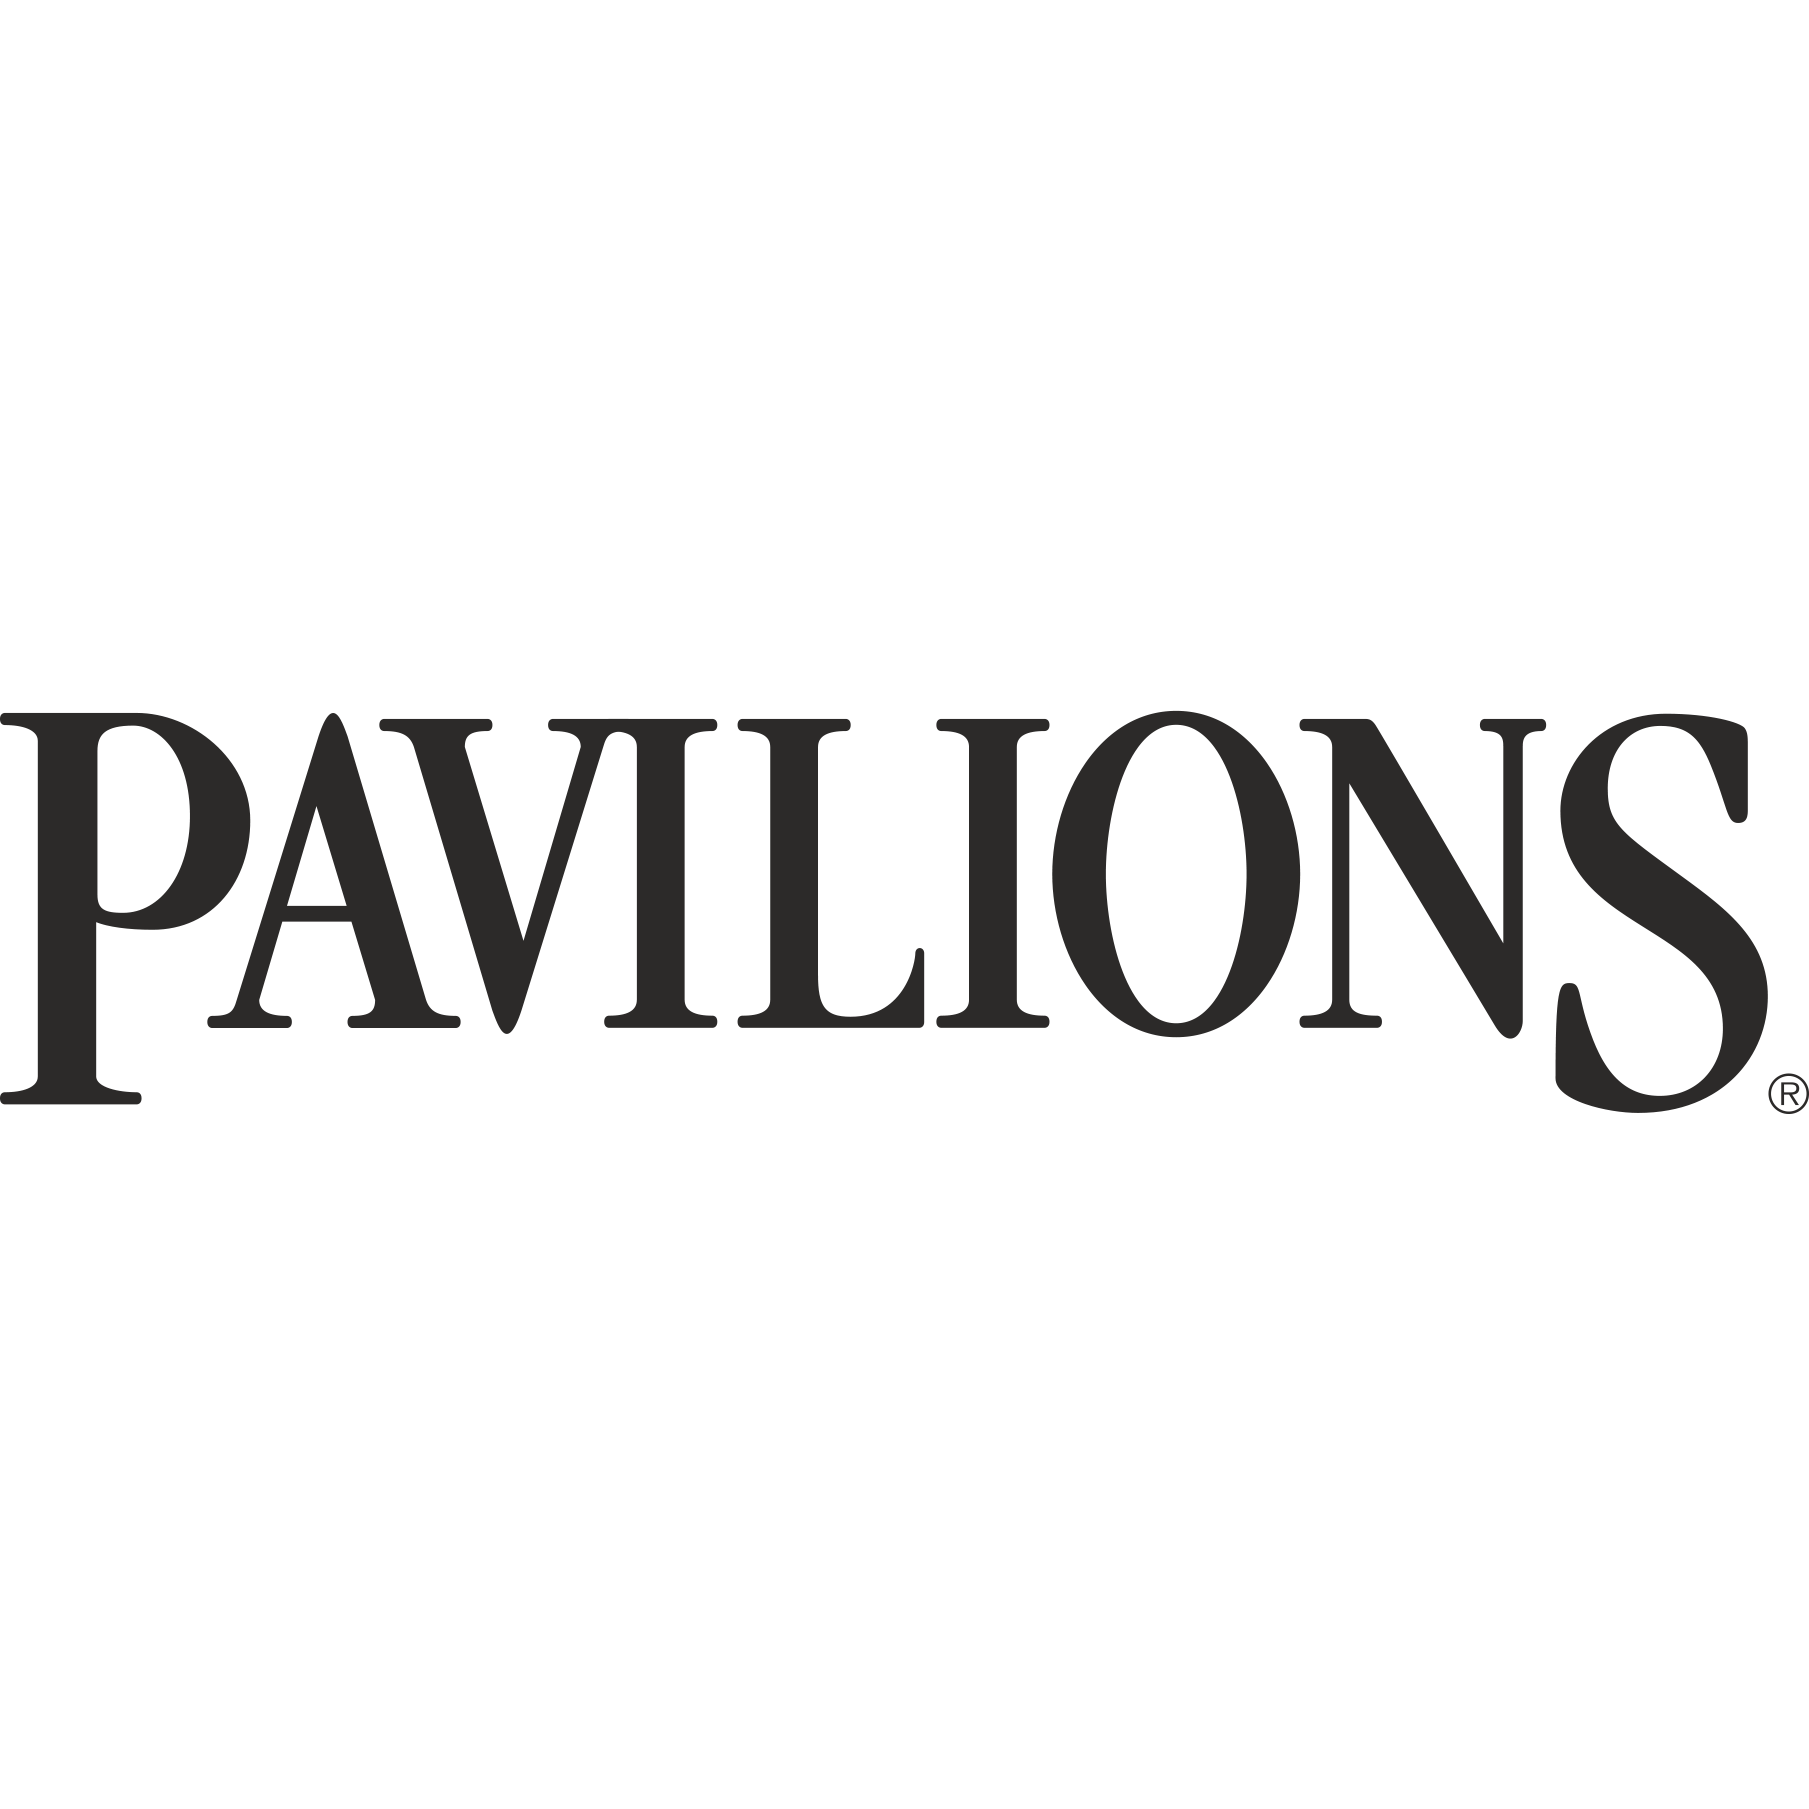 Pavilions Pharmacy - Thousand Oaks, CA - Pharmacist